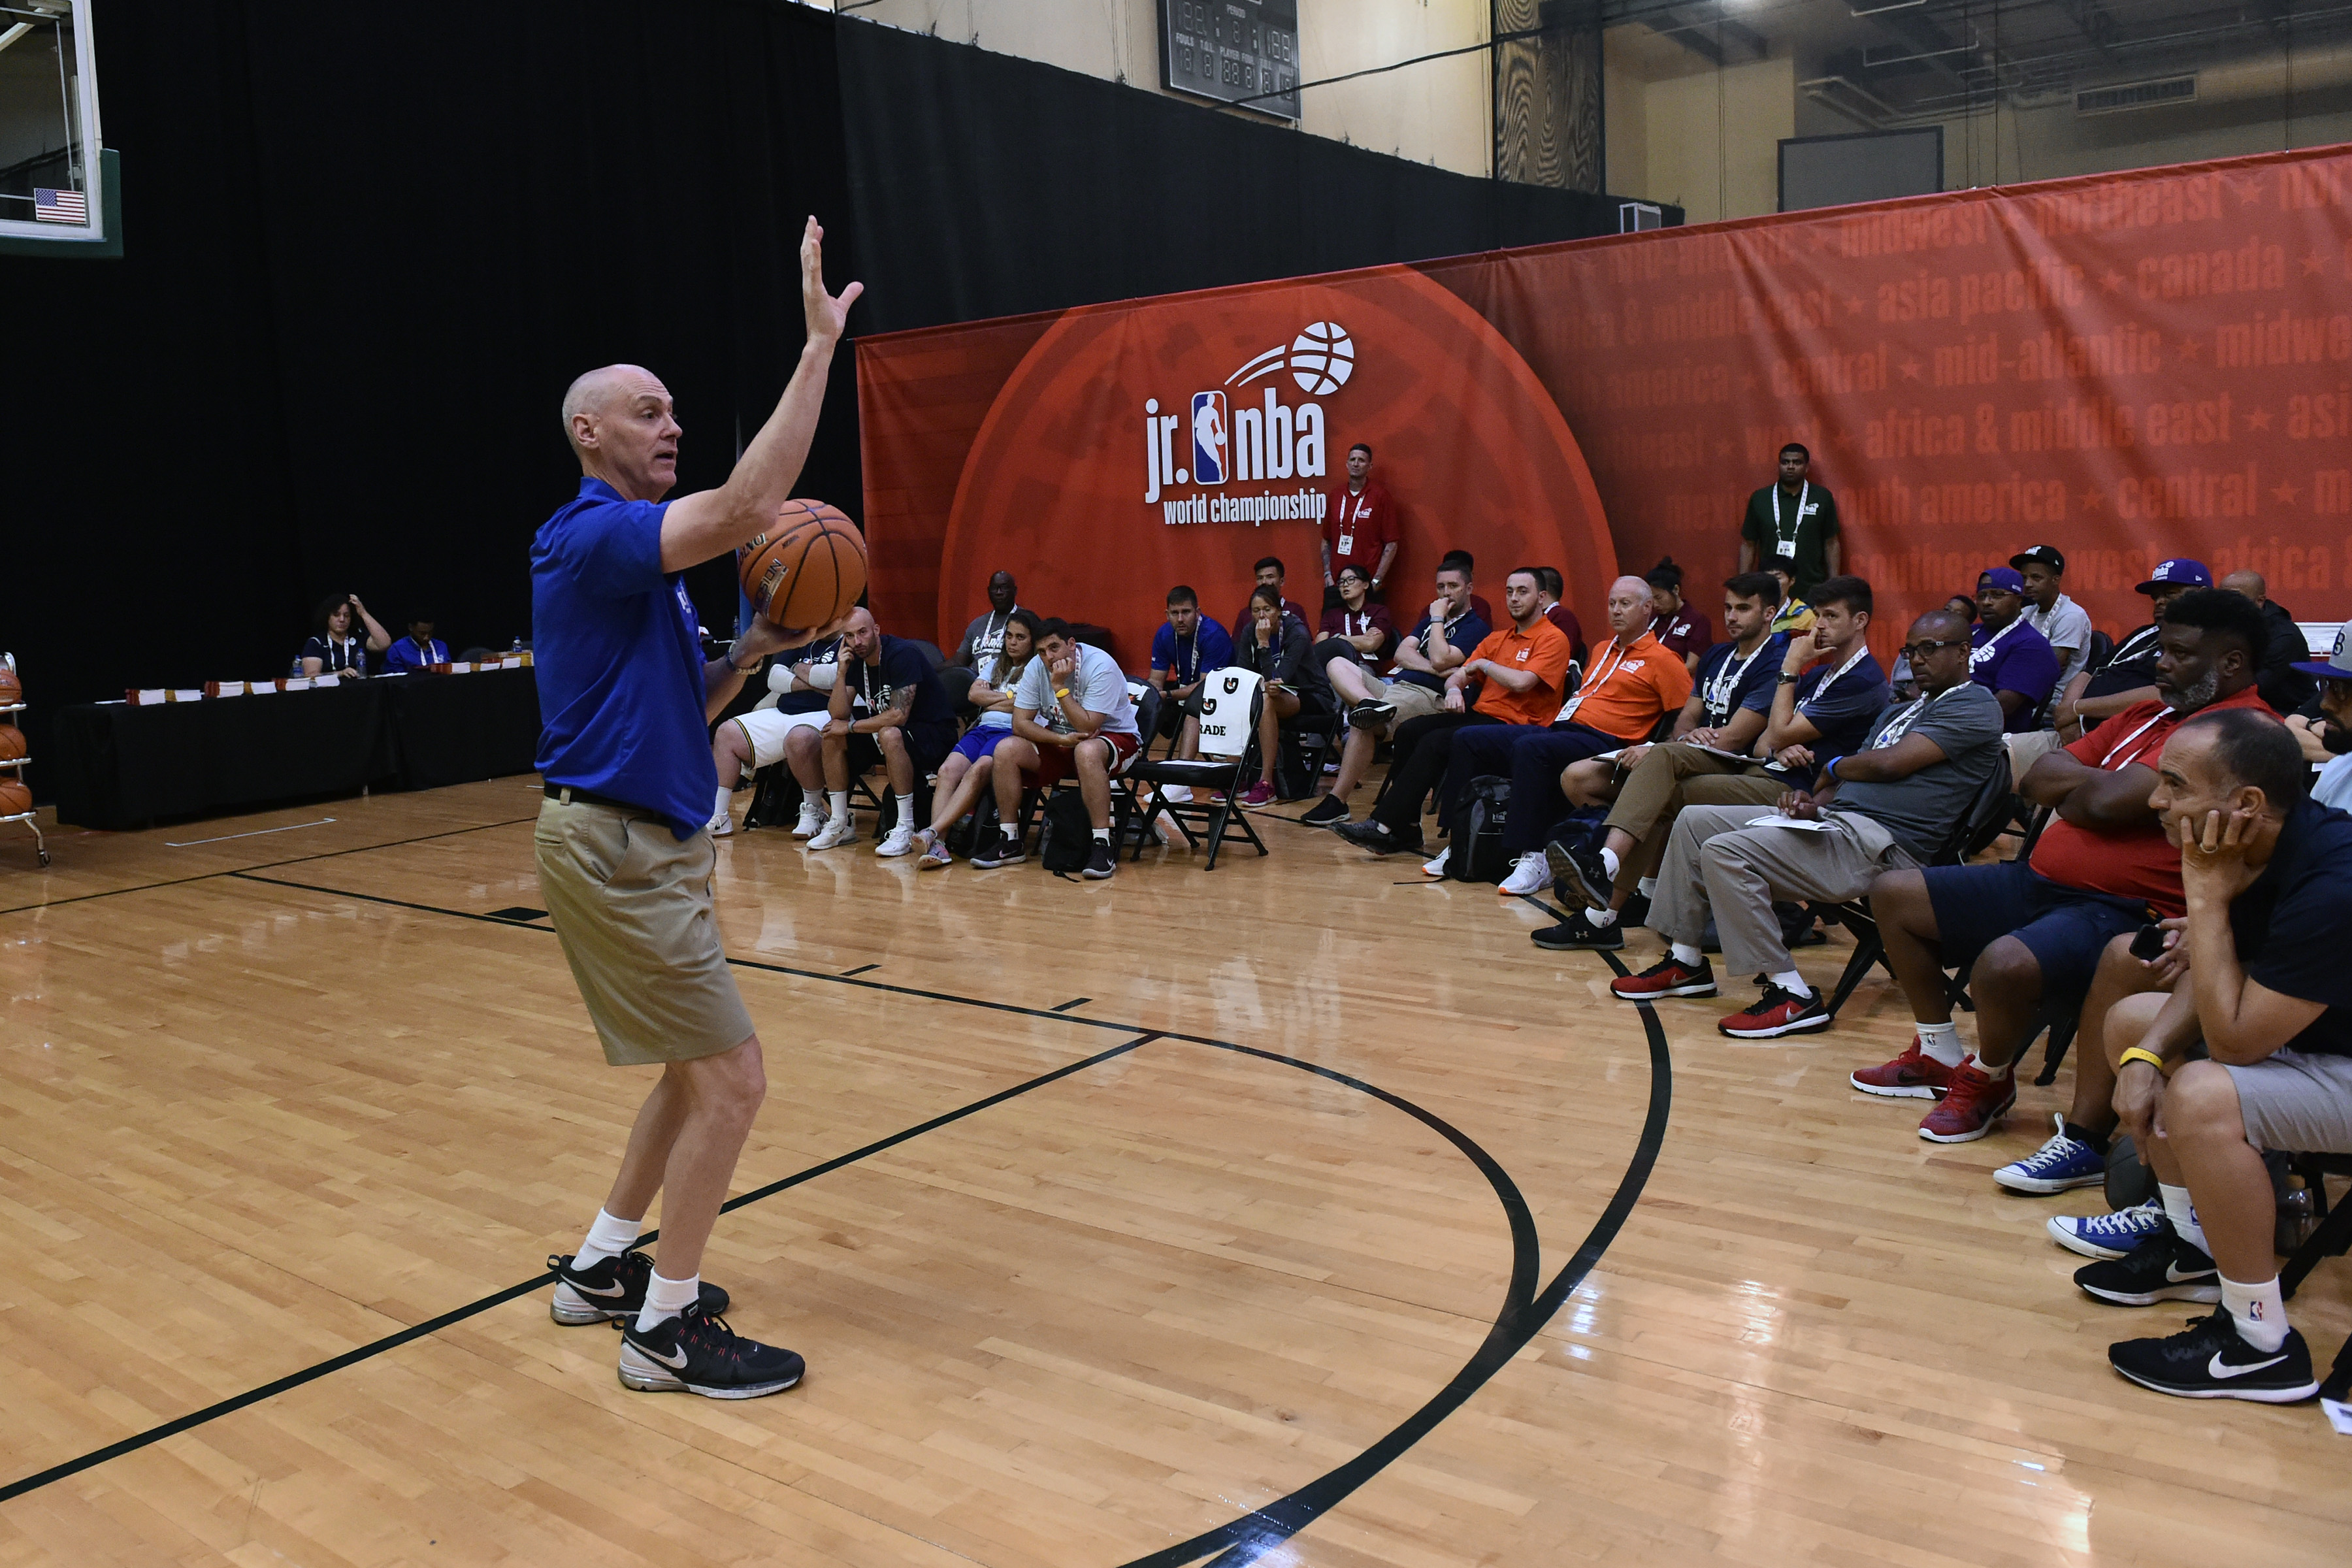 Mavericks coach Rick Carlisle is a guiding force at the Jr. NBA World Championship in Orlando, a 'celebratory melting pot' of basketball